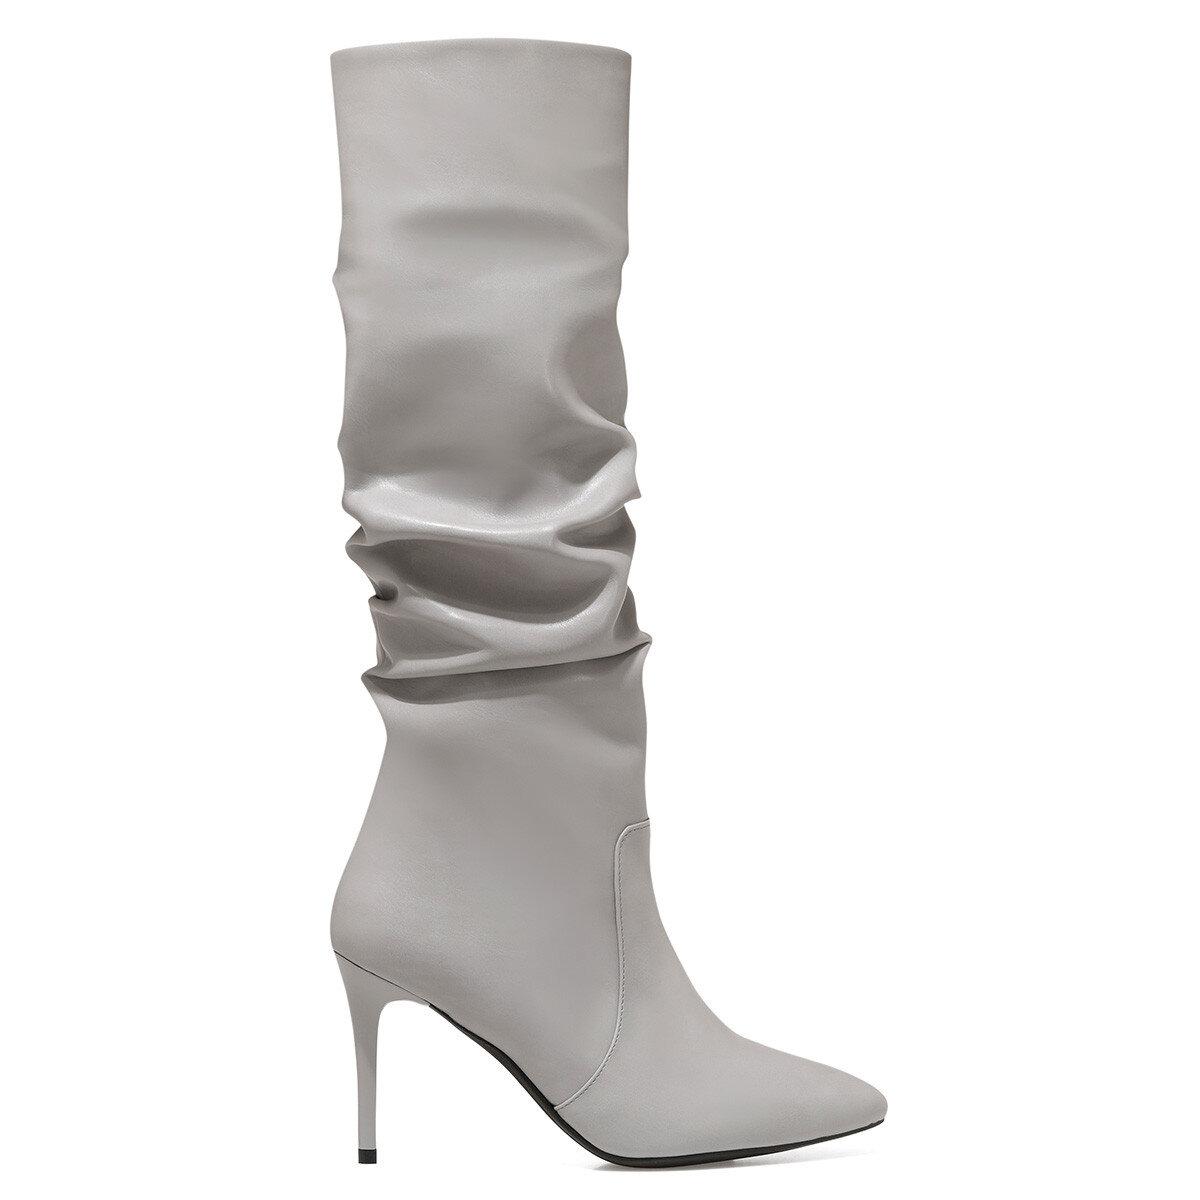 PINTO Gri Kadın Topuklu Çizme